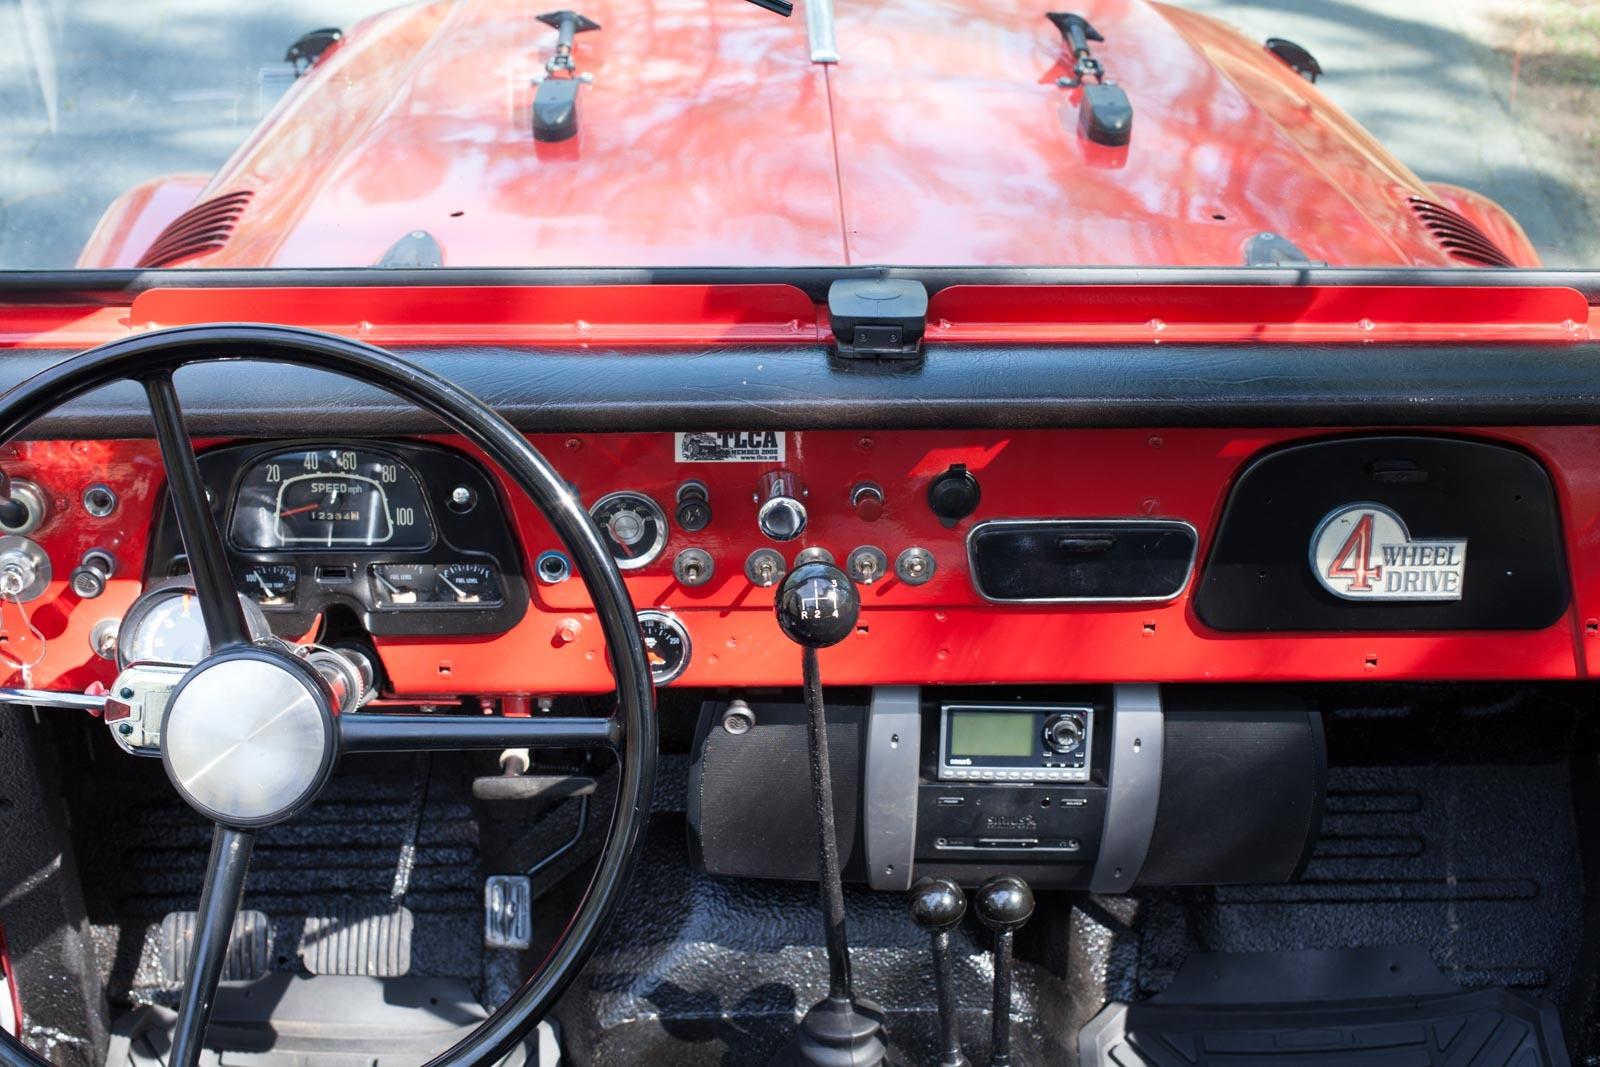 1969 Toyota Fj40 Land Cruiser Fizbo Wiring Harness 4 20150403